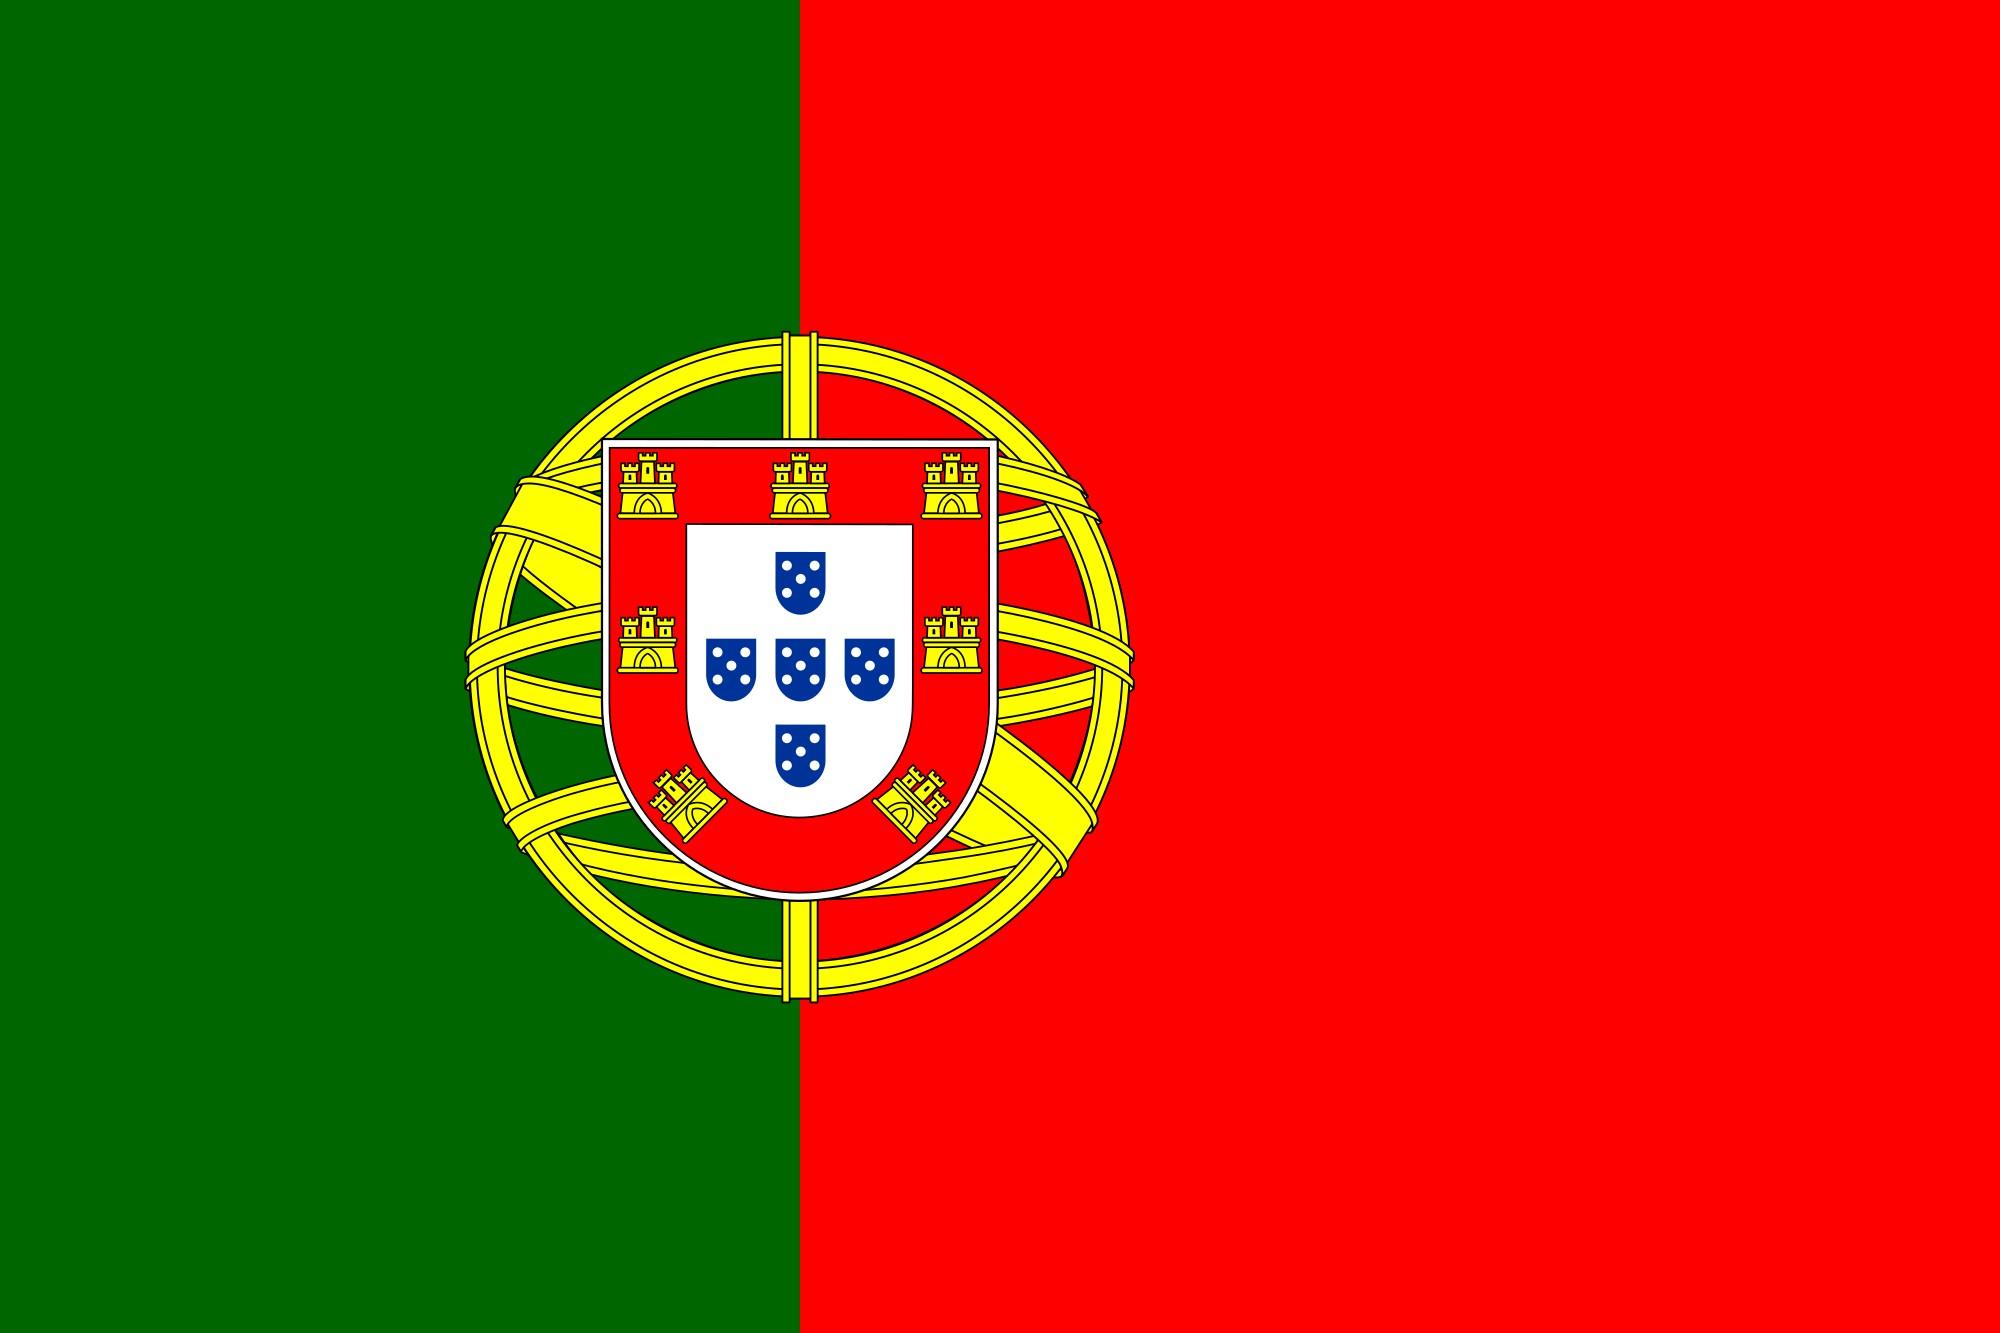 Flag of Portugalg